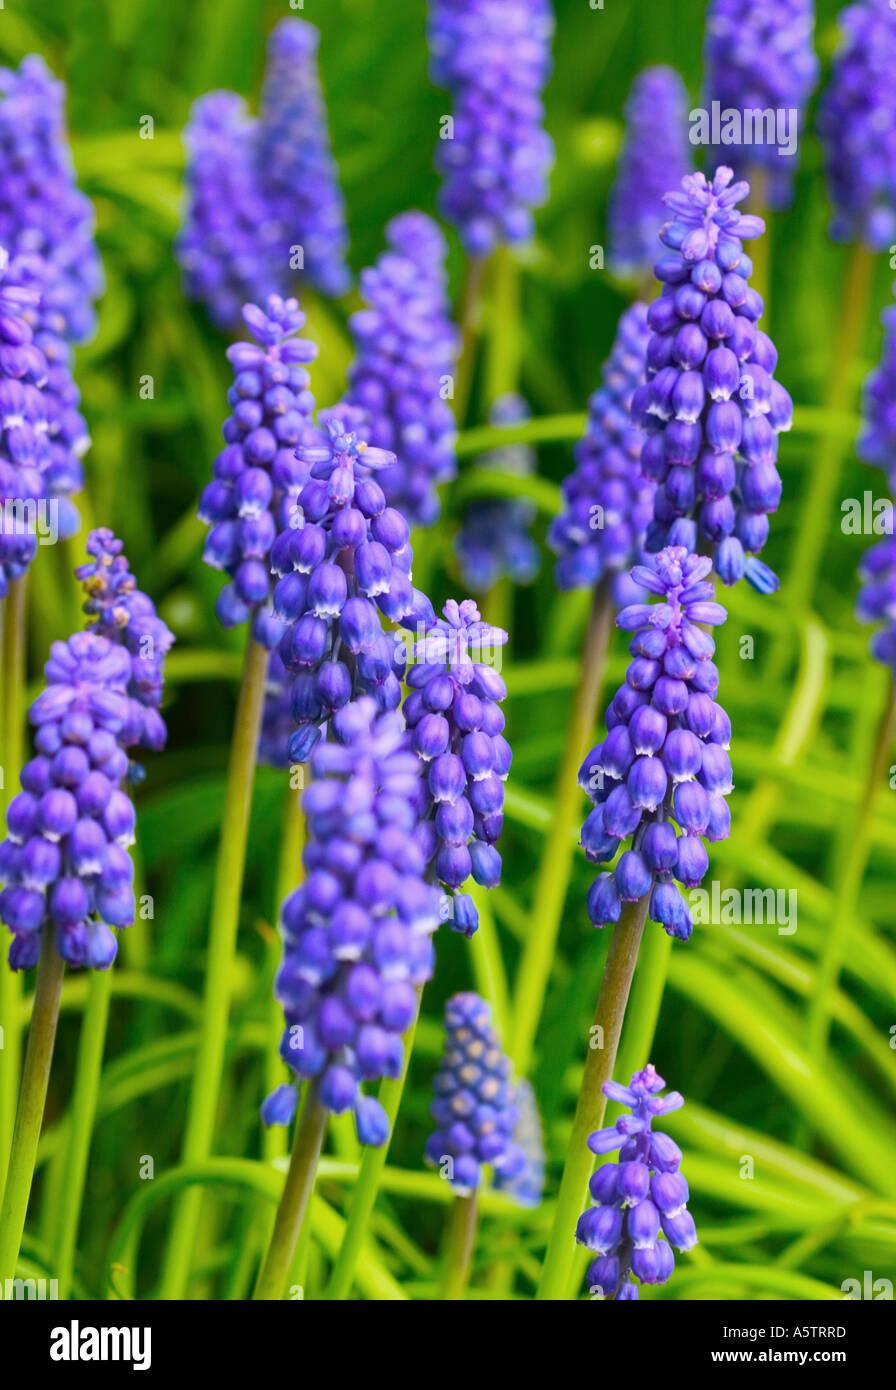 Lots small blue flowers common stock photos lots small blue common name grape hyacinth latin name muscari hyacinth stock image izmirmasajfo